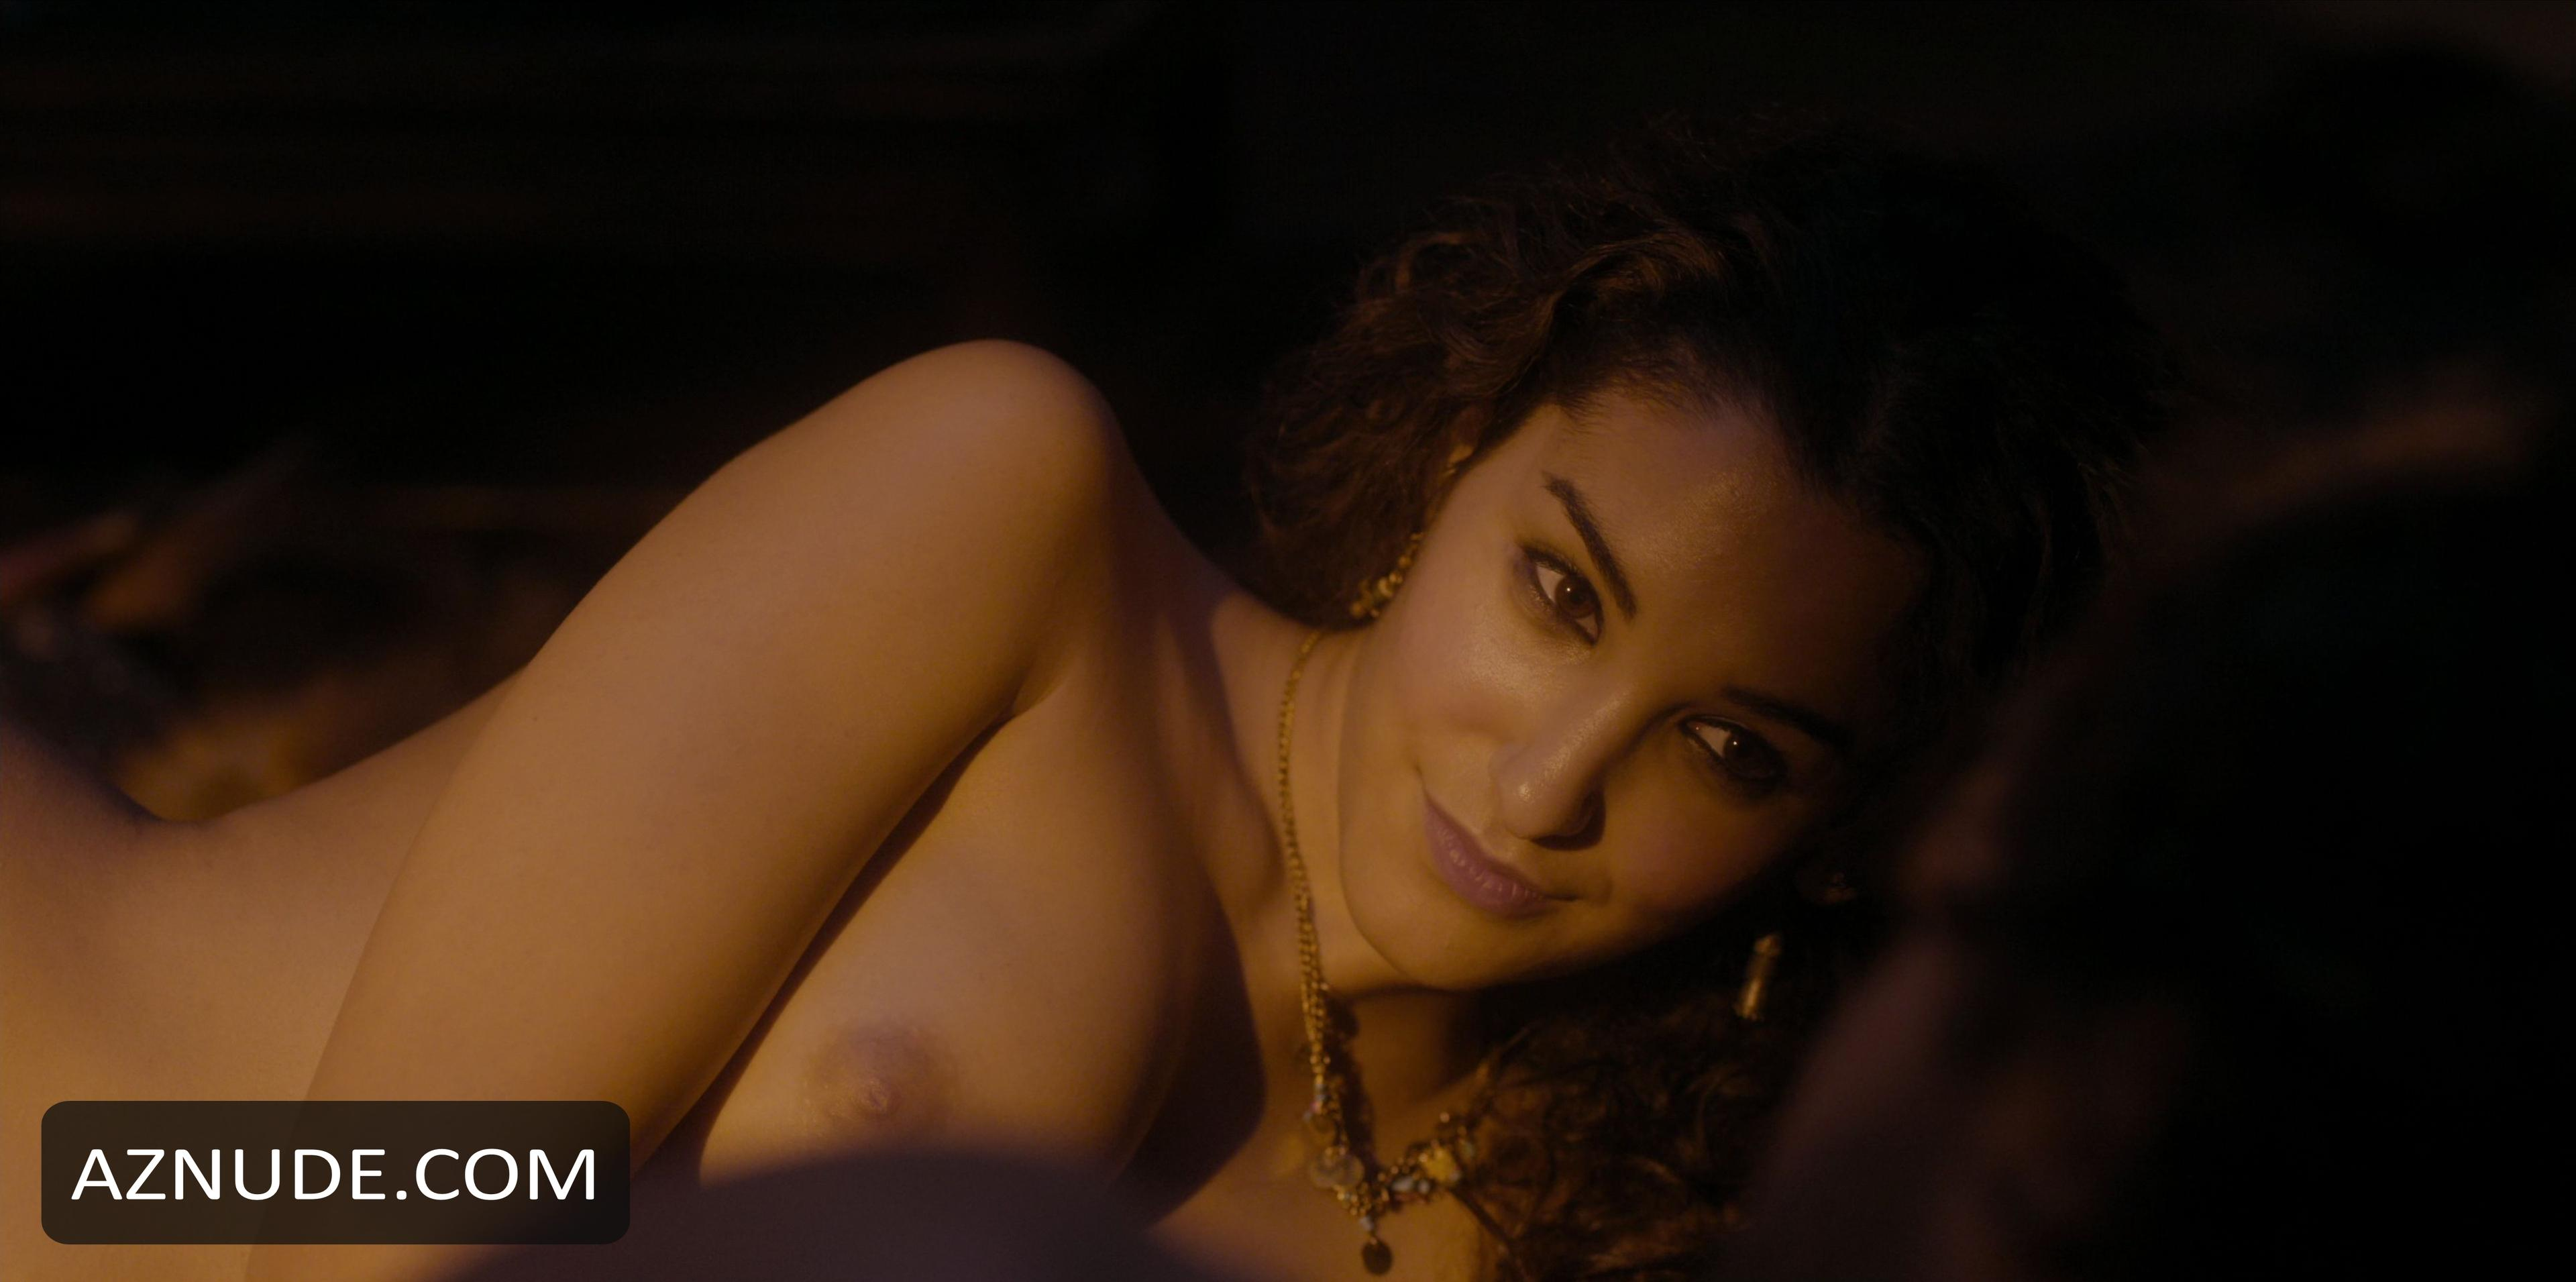 Laura prats nude